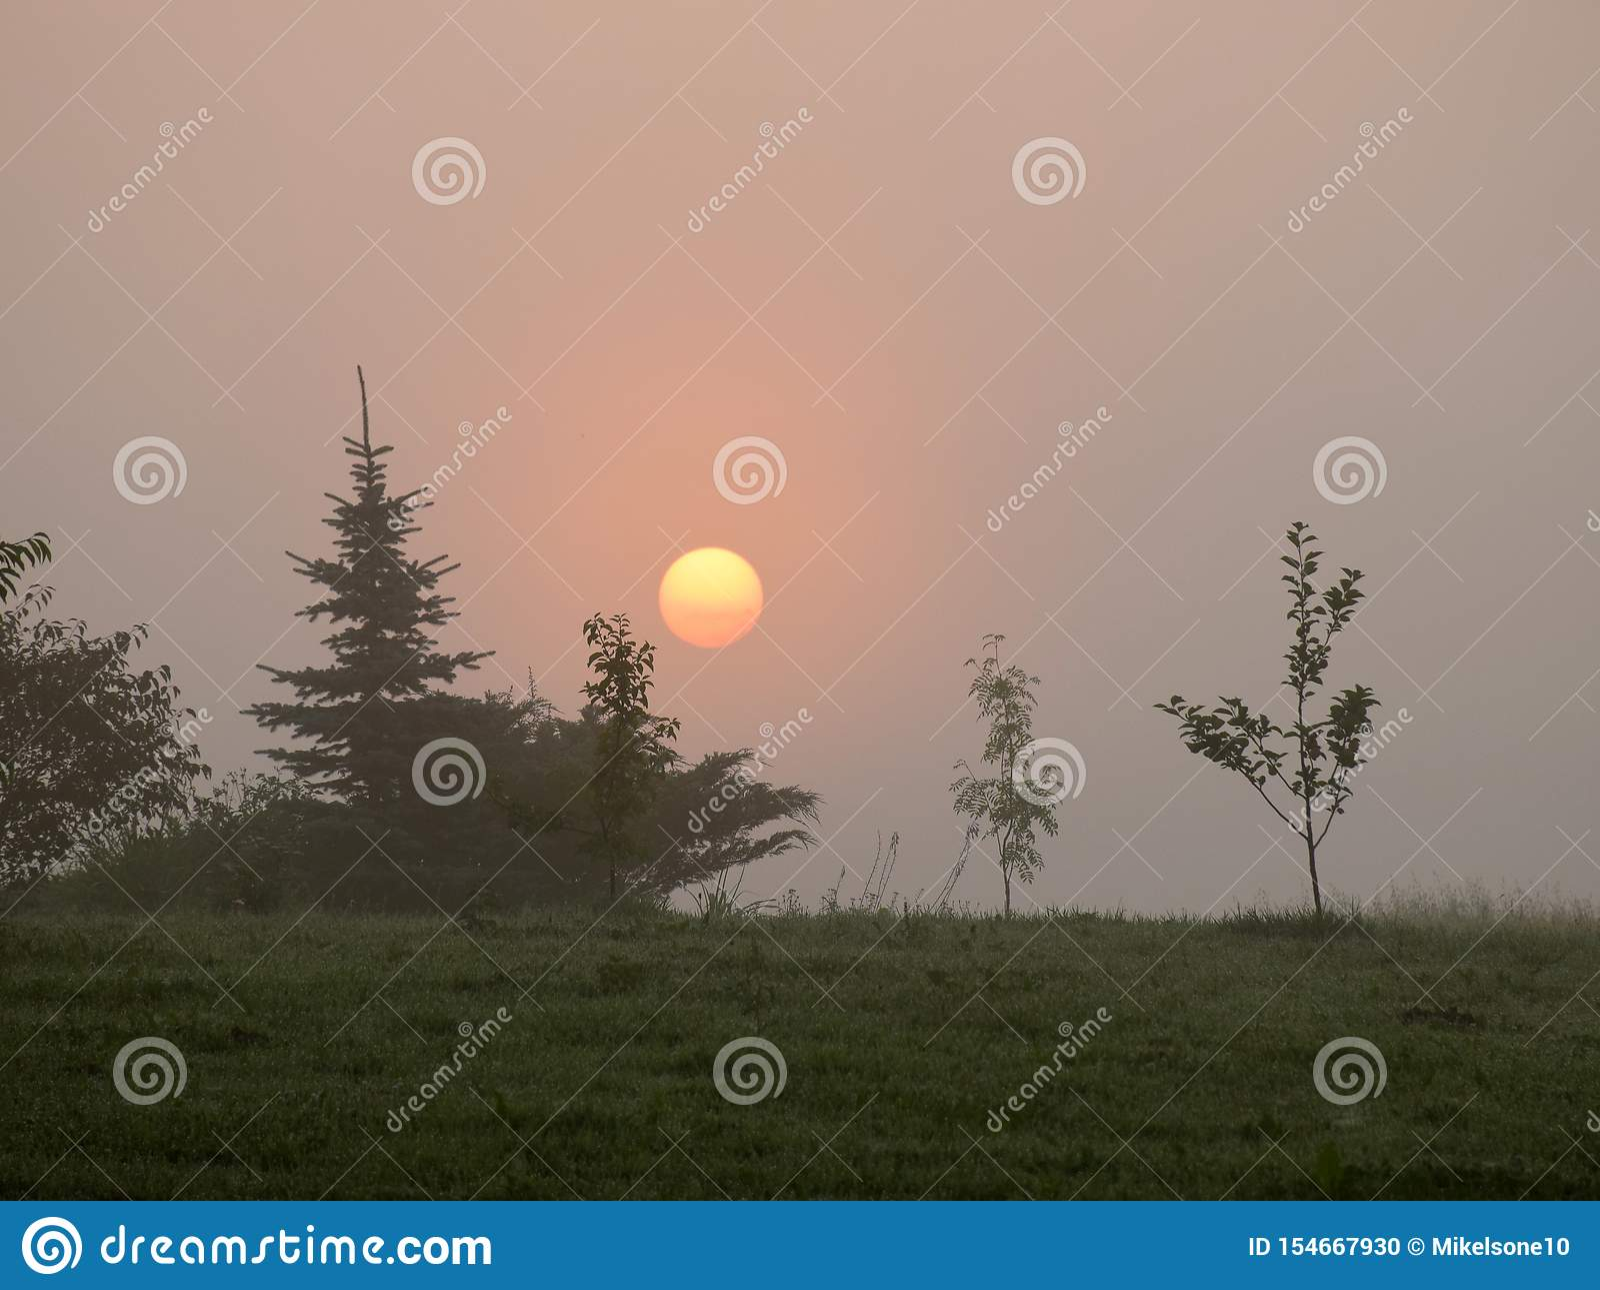 Mystical sun in the morning light